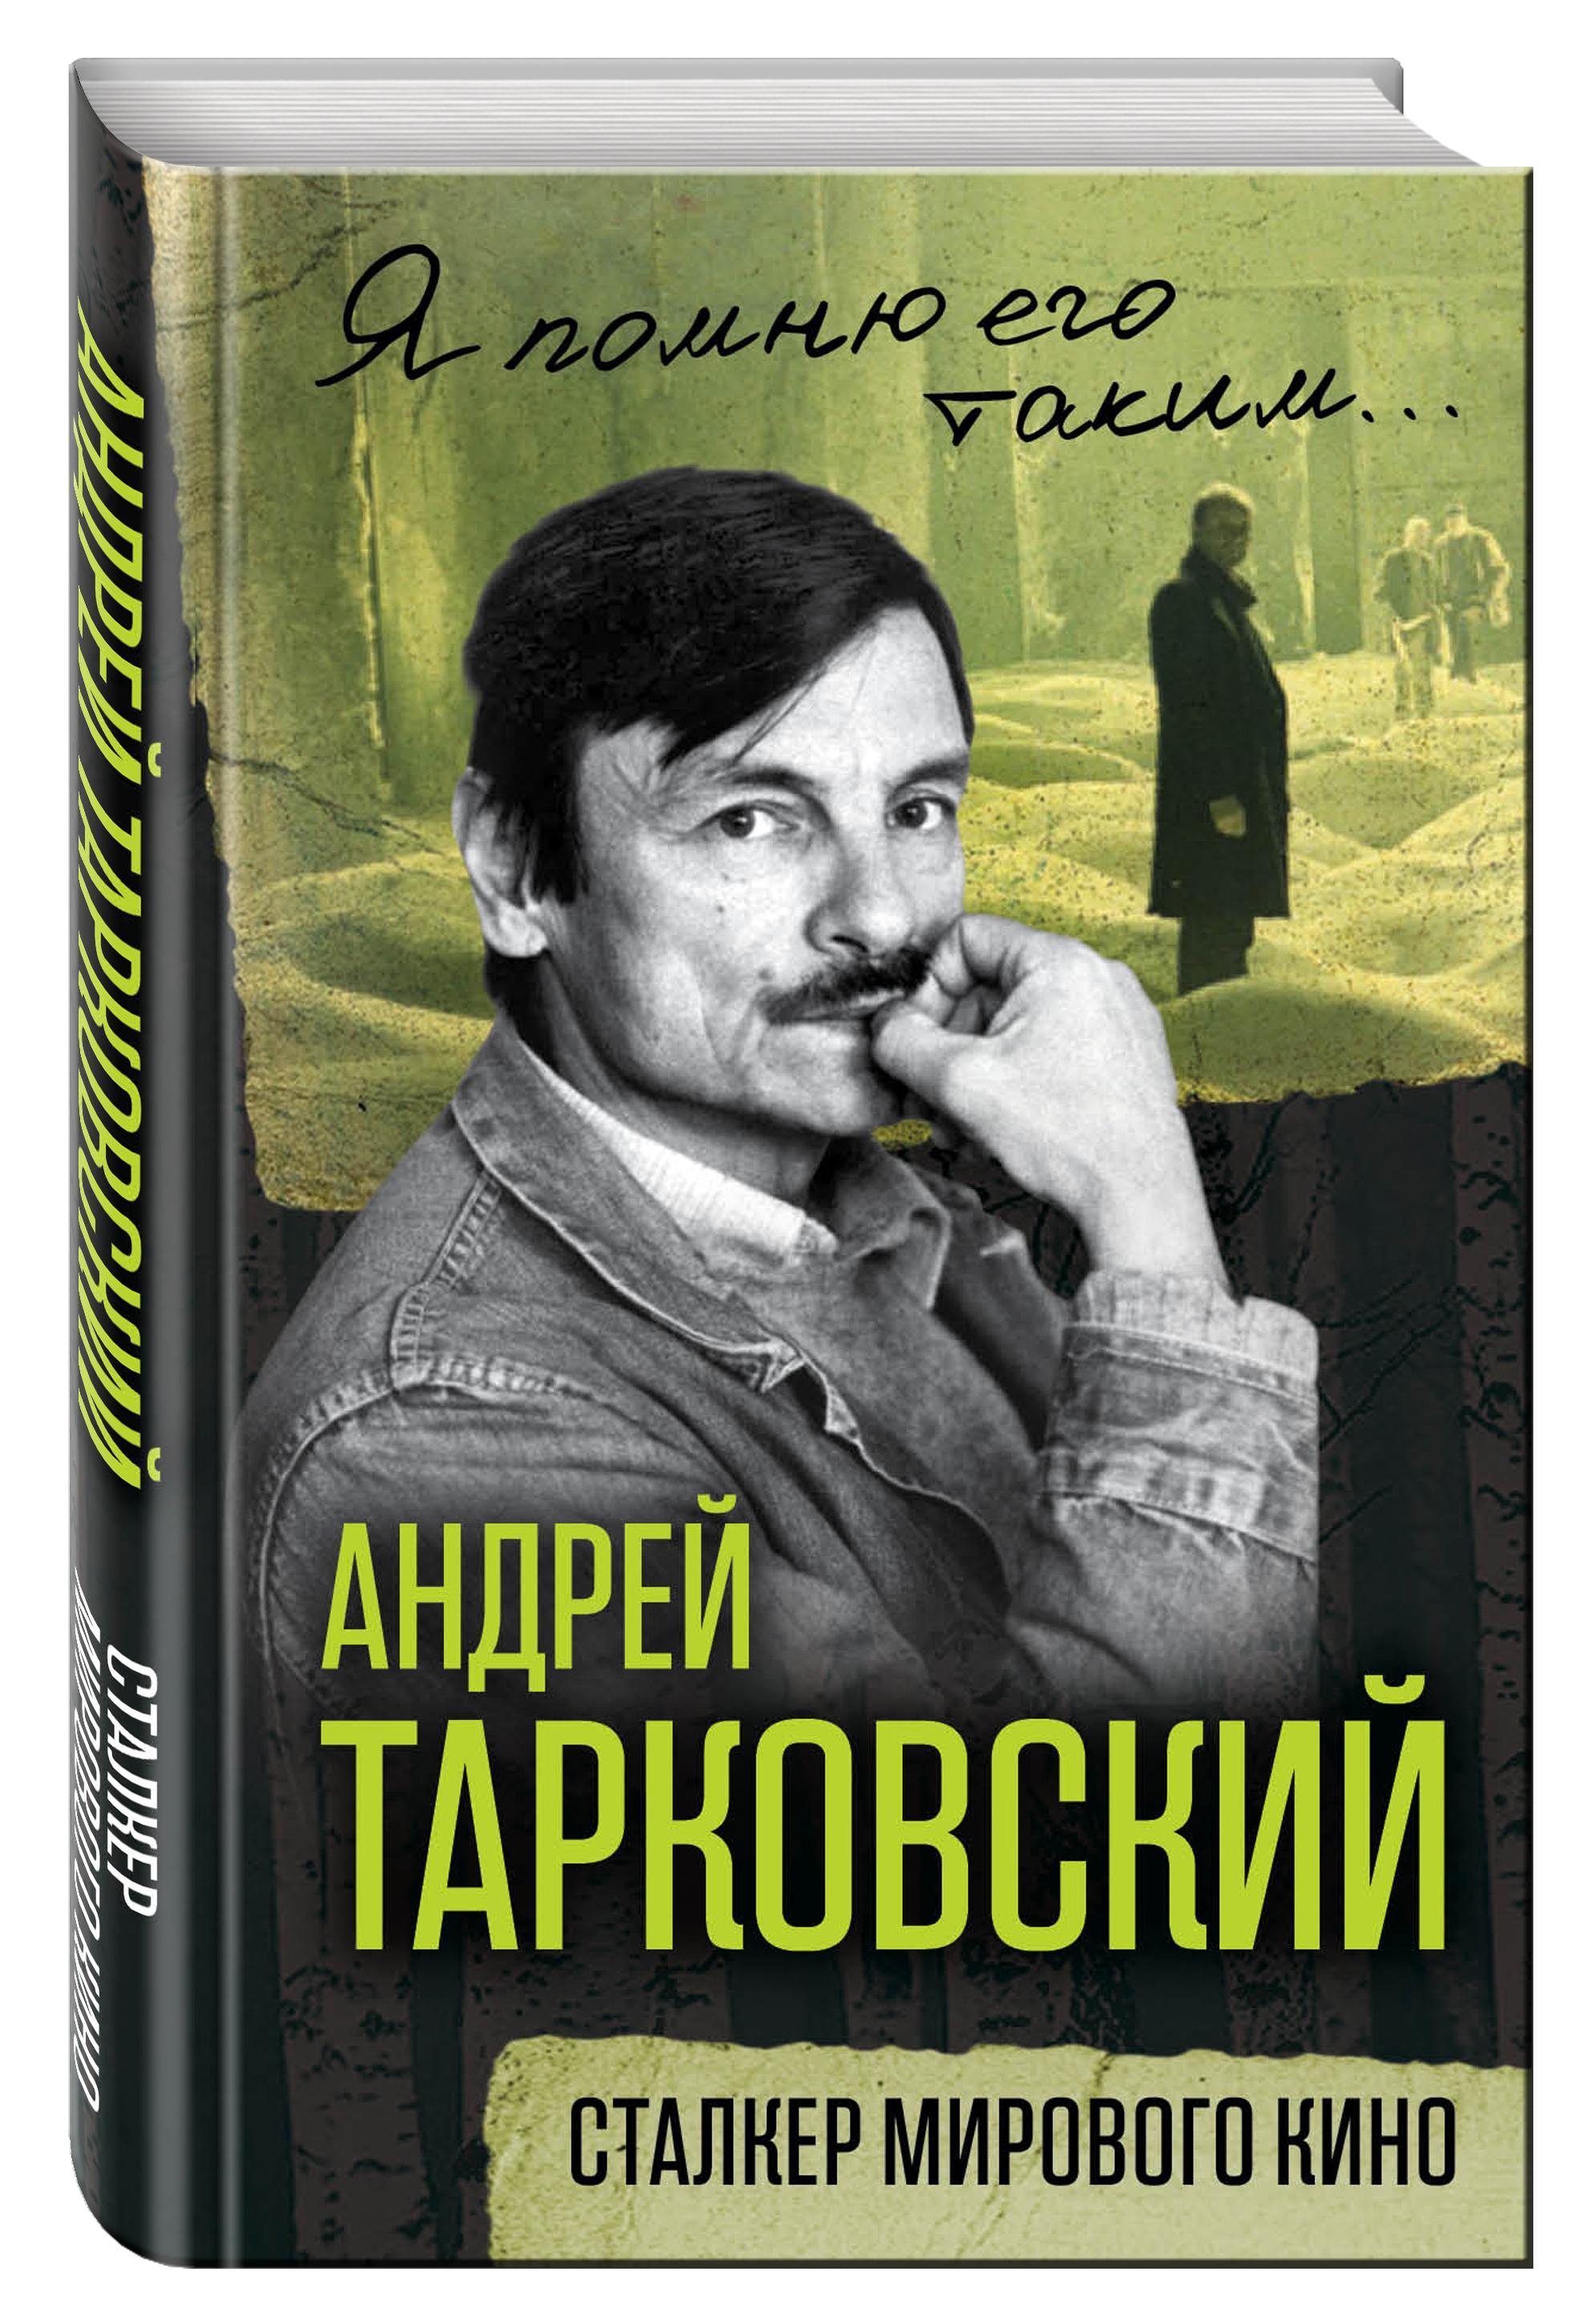 Ярополов Я.А. Андрей Тарковский. Сталкер мирового кино